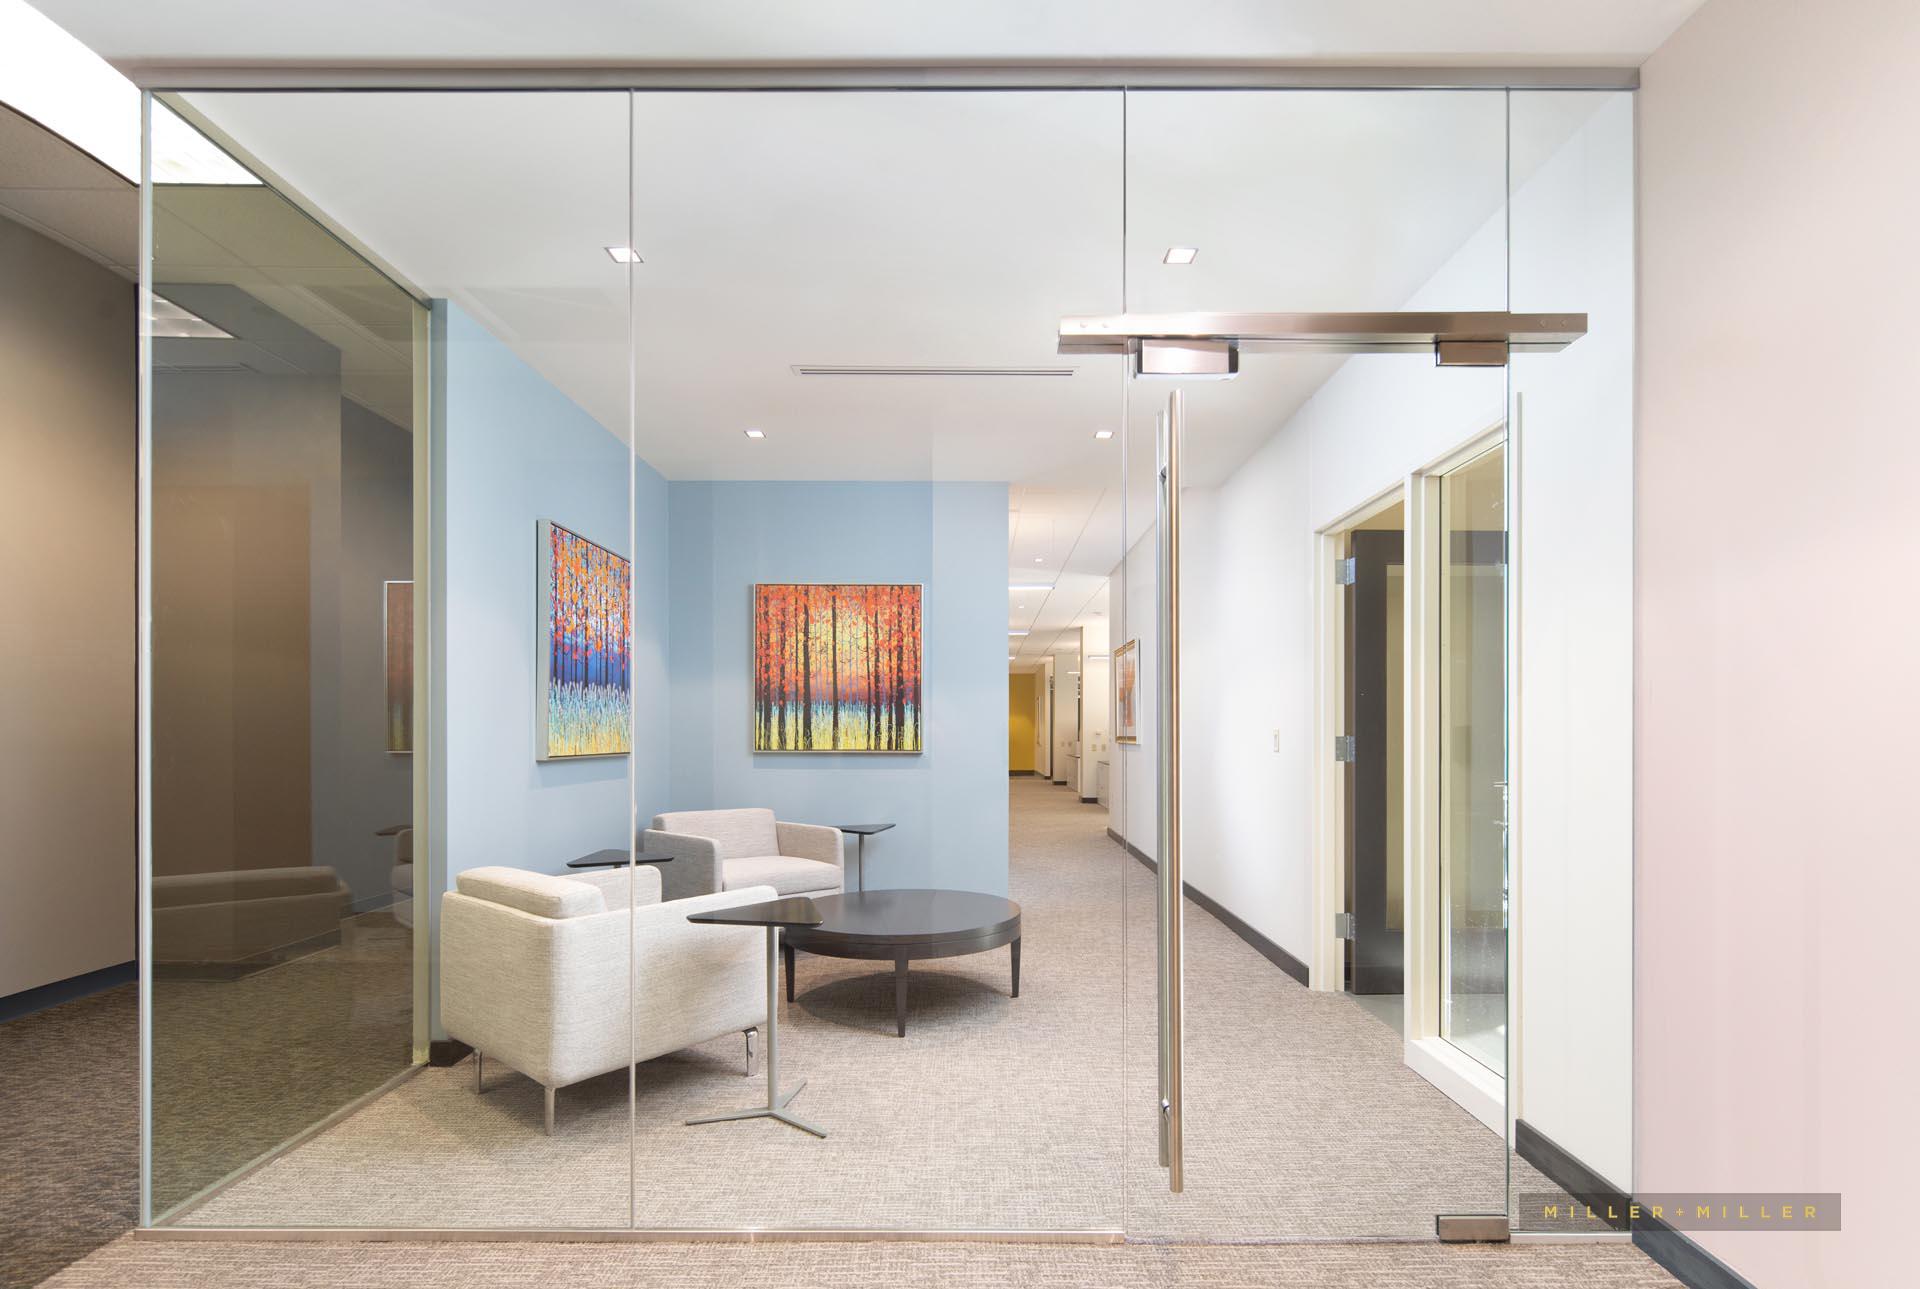 medical hospital interior renovation photography